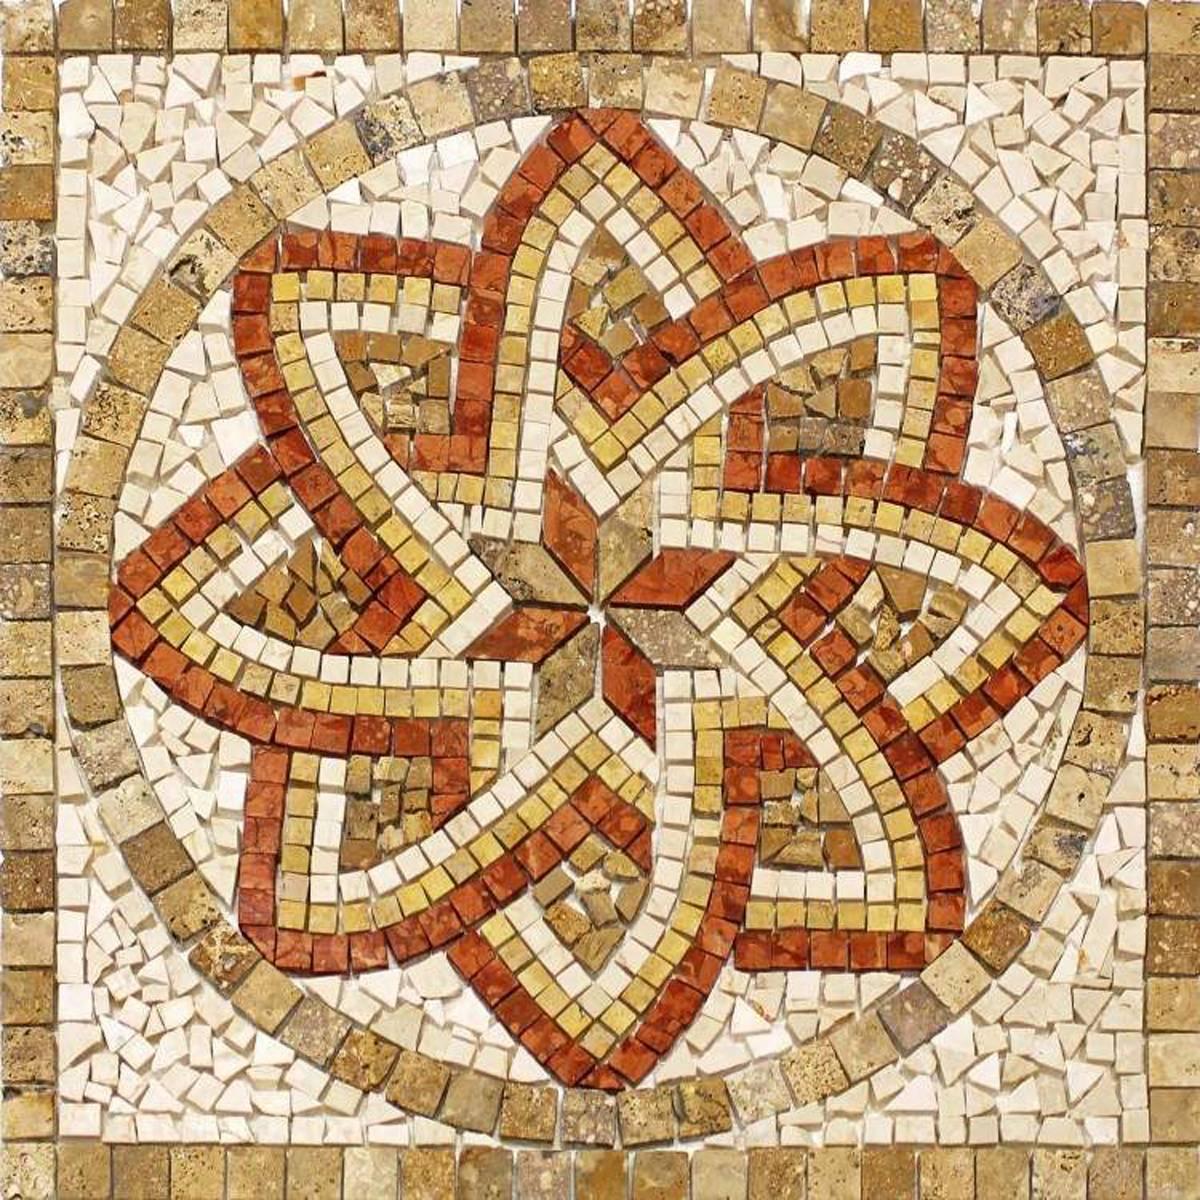 Rosoni rosone mosaico in marmo su rete per interni esterni 80x80 FLORIUM NOCE – Quaranta Store